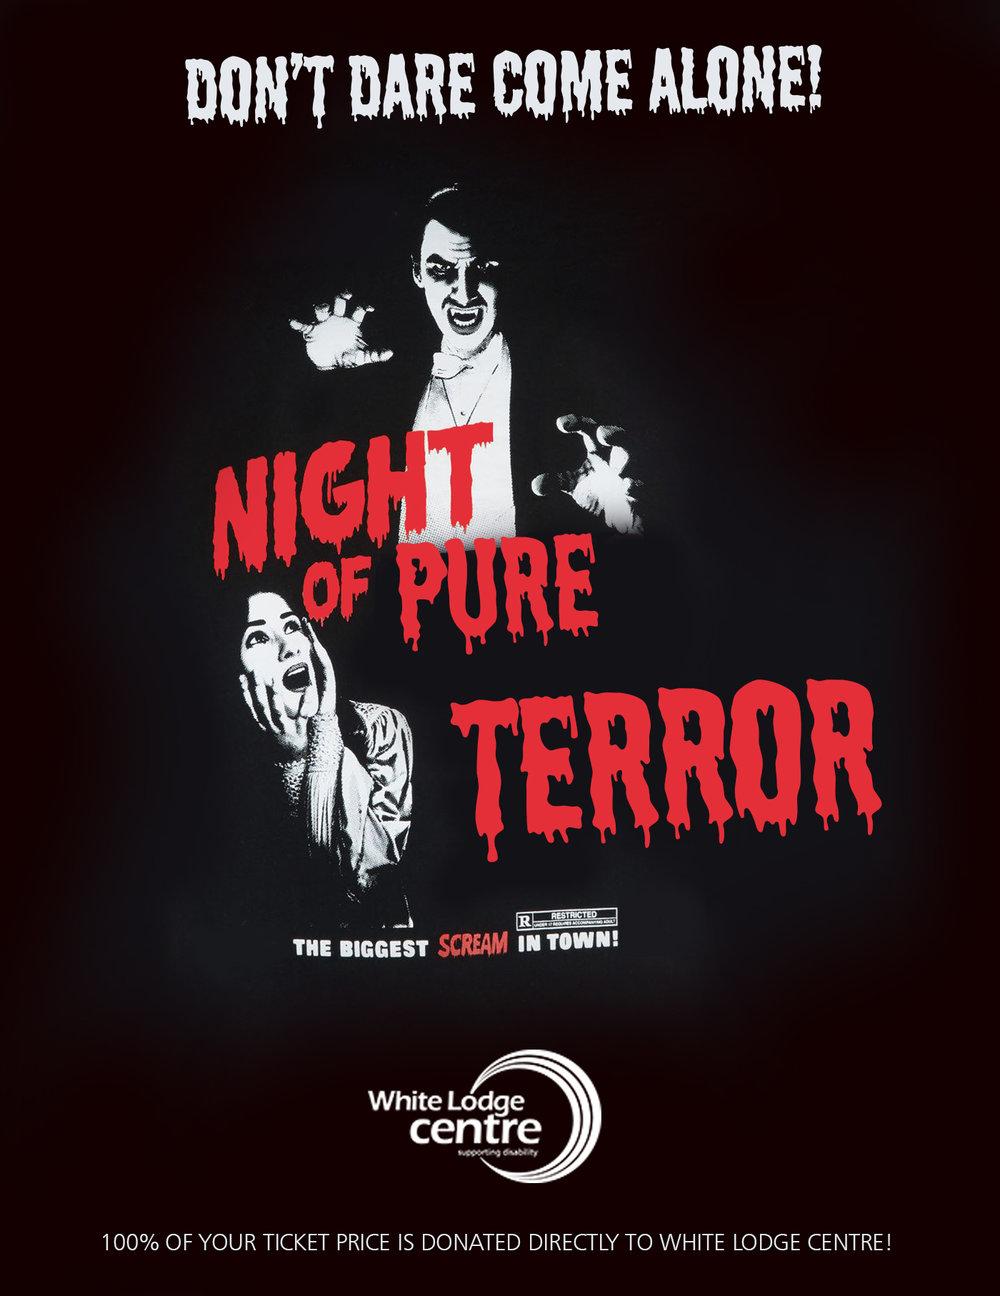 Night-of-PURE-Terror-1200.jpg